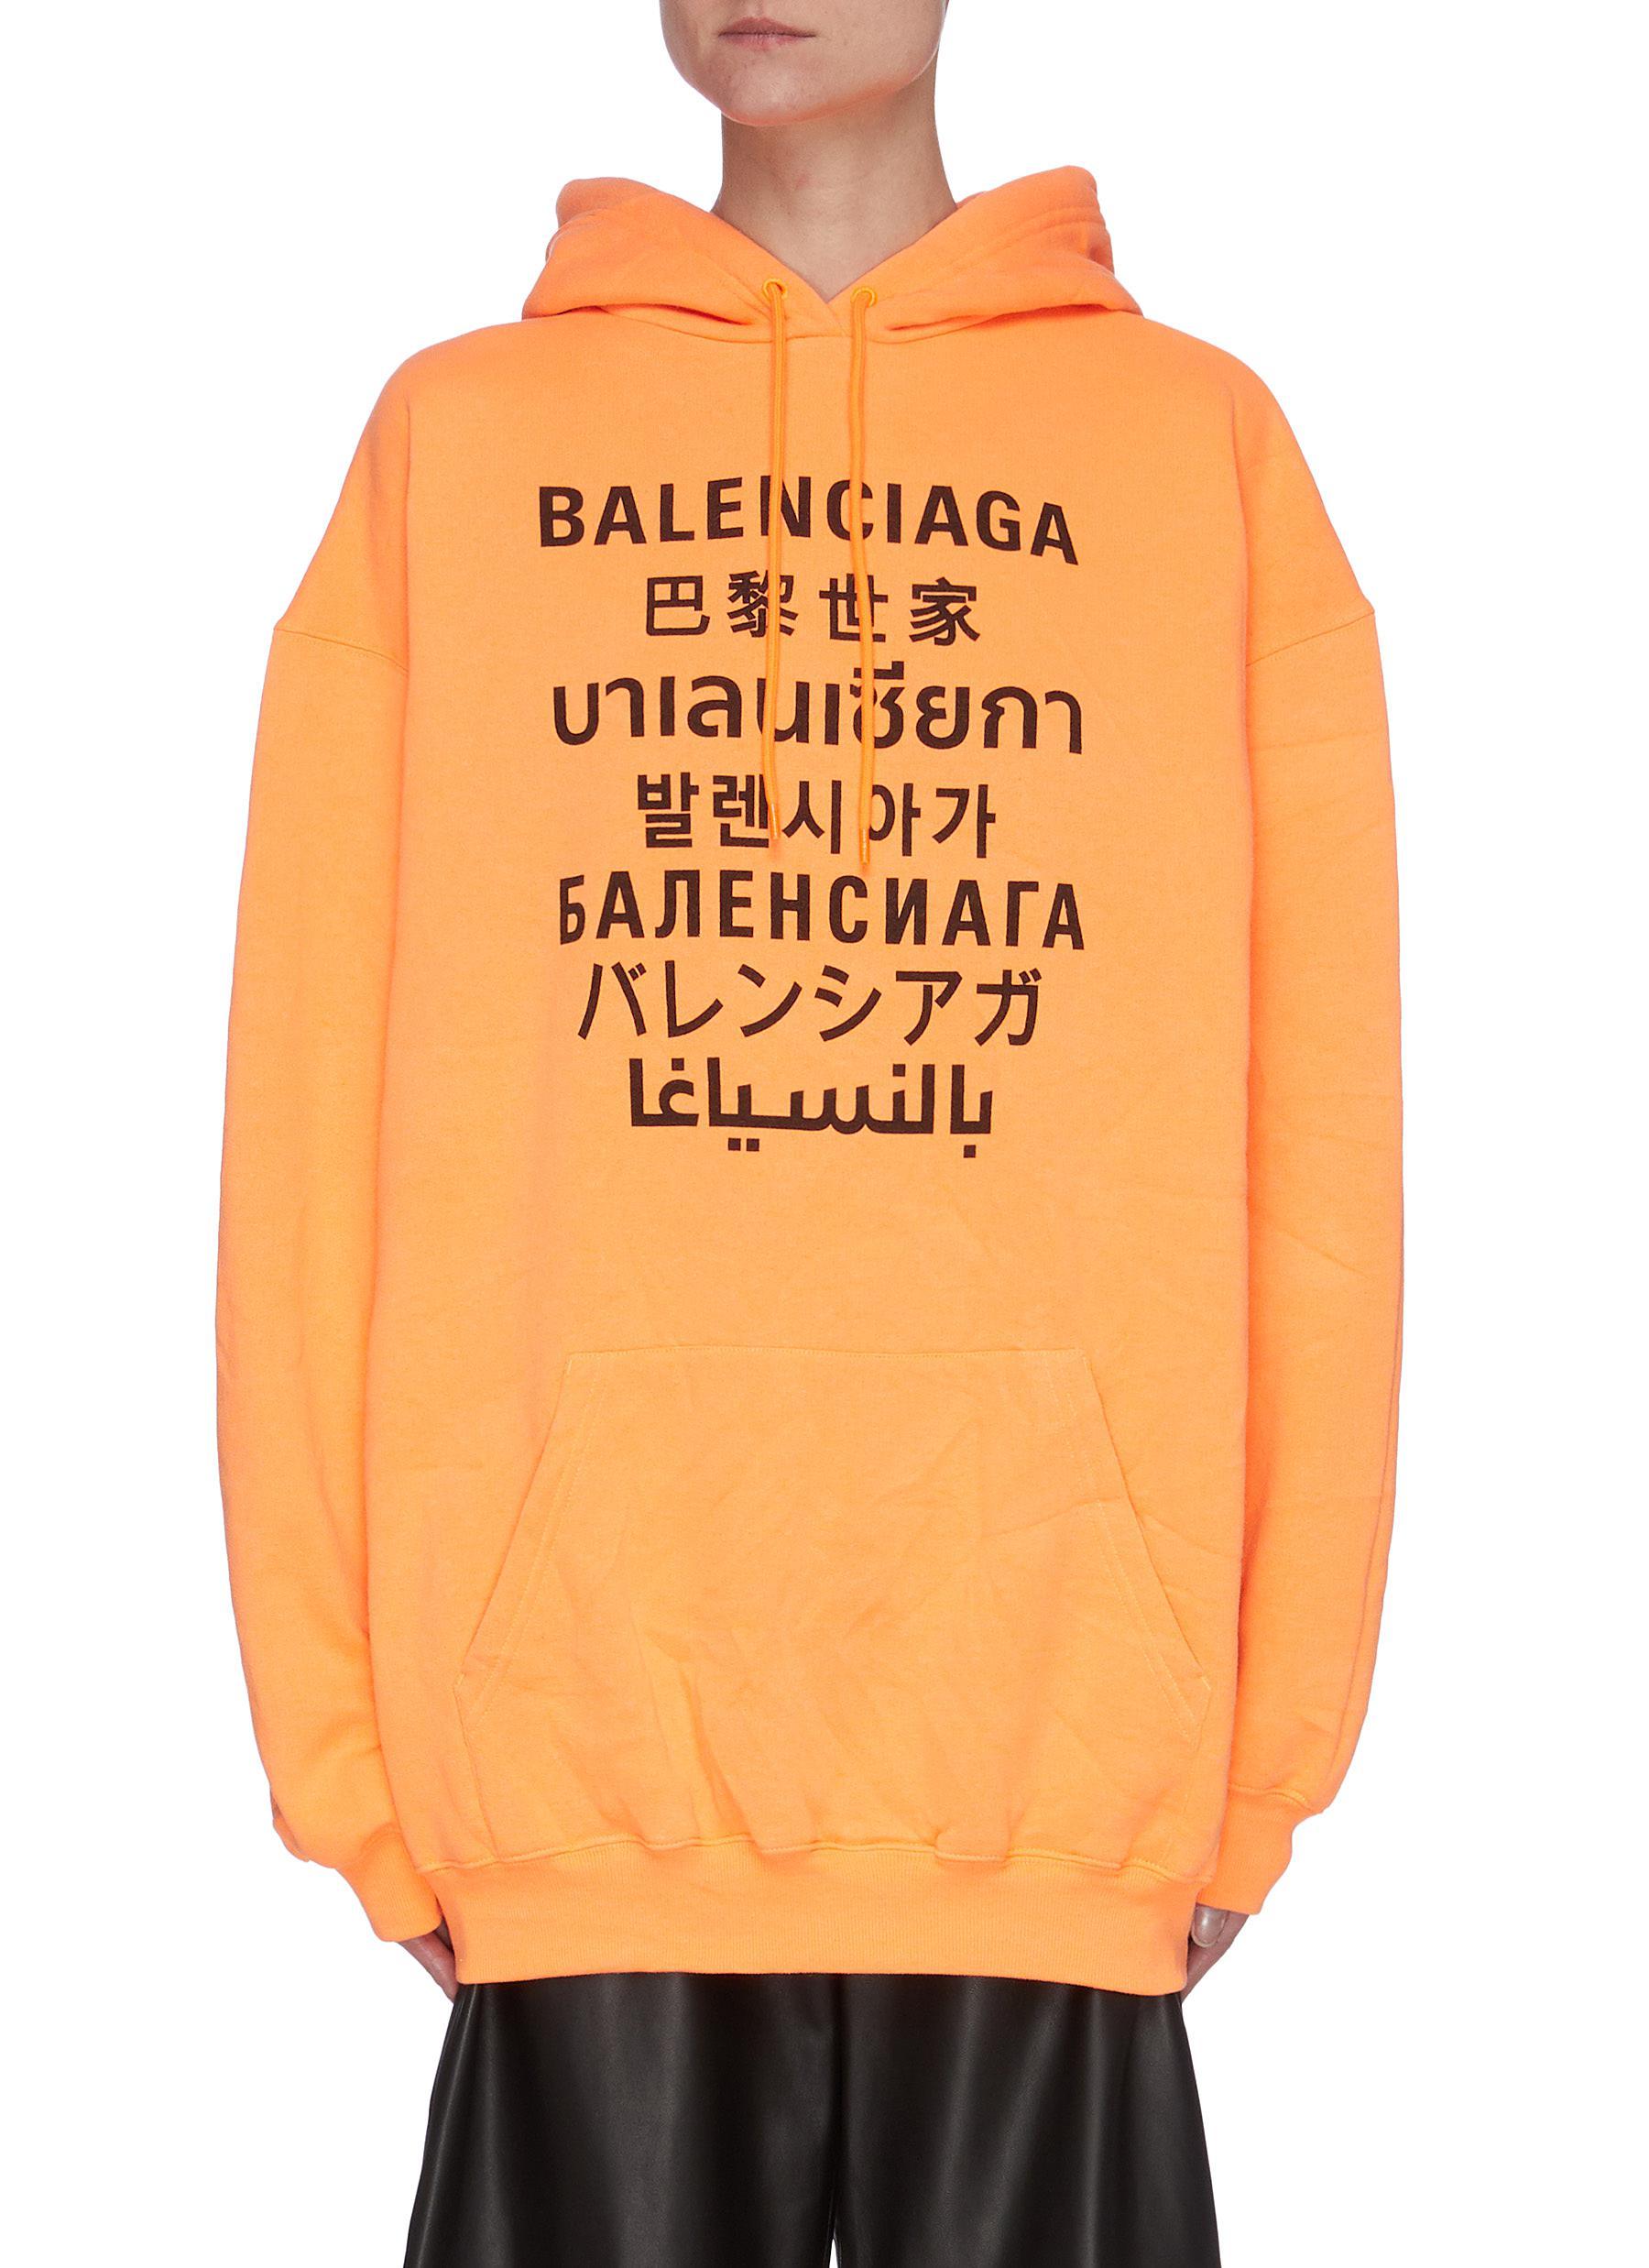 Balenciaga Cottons MULTILINGUAL LOGO ORGANIC COTTON BLEND HOODIE